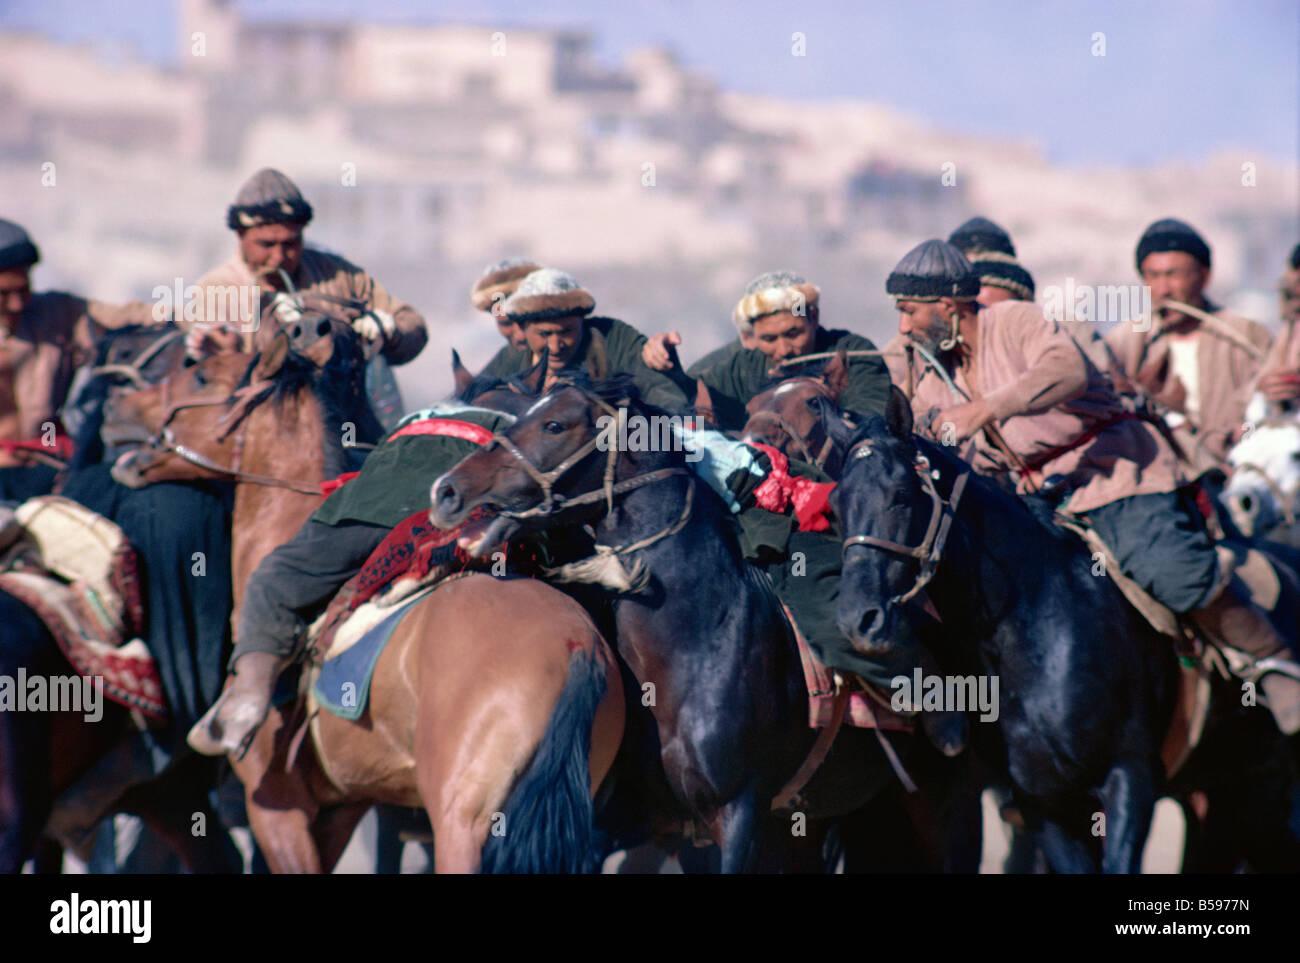 Buzkashi Kabul Afghanistan Asia - Stock Image